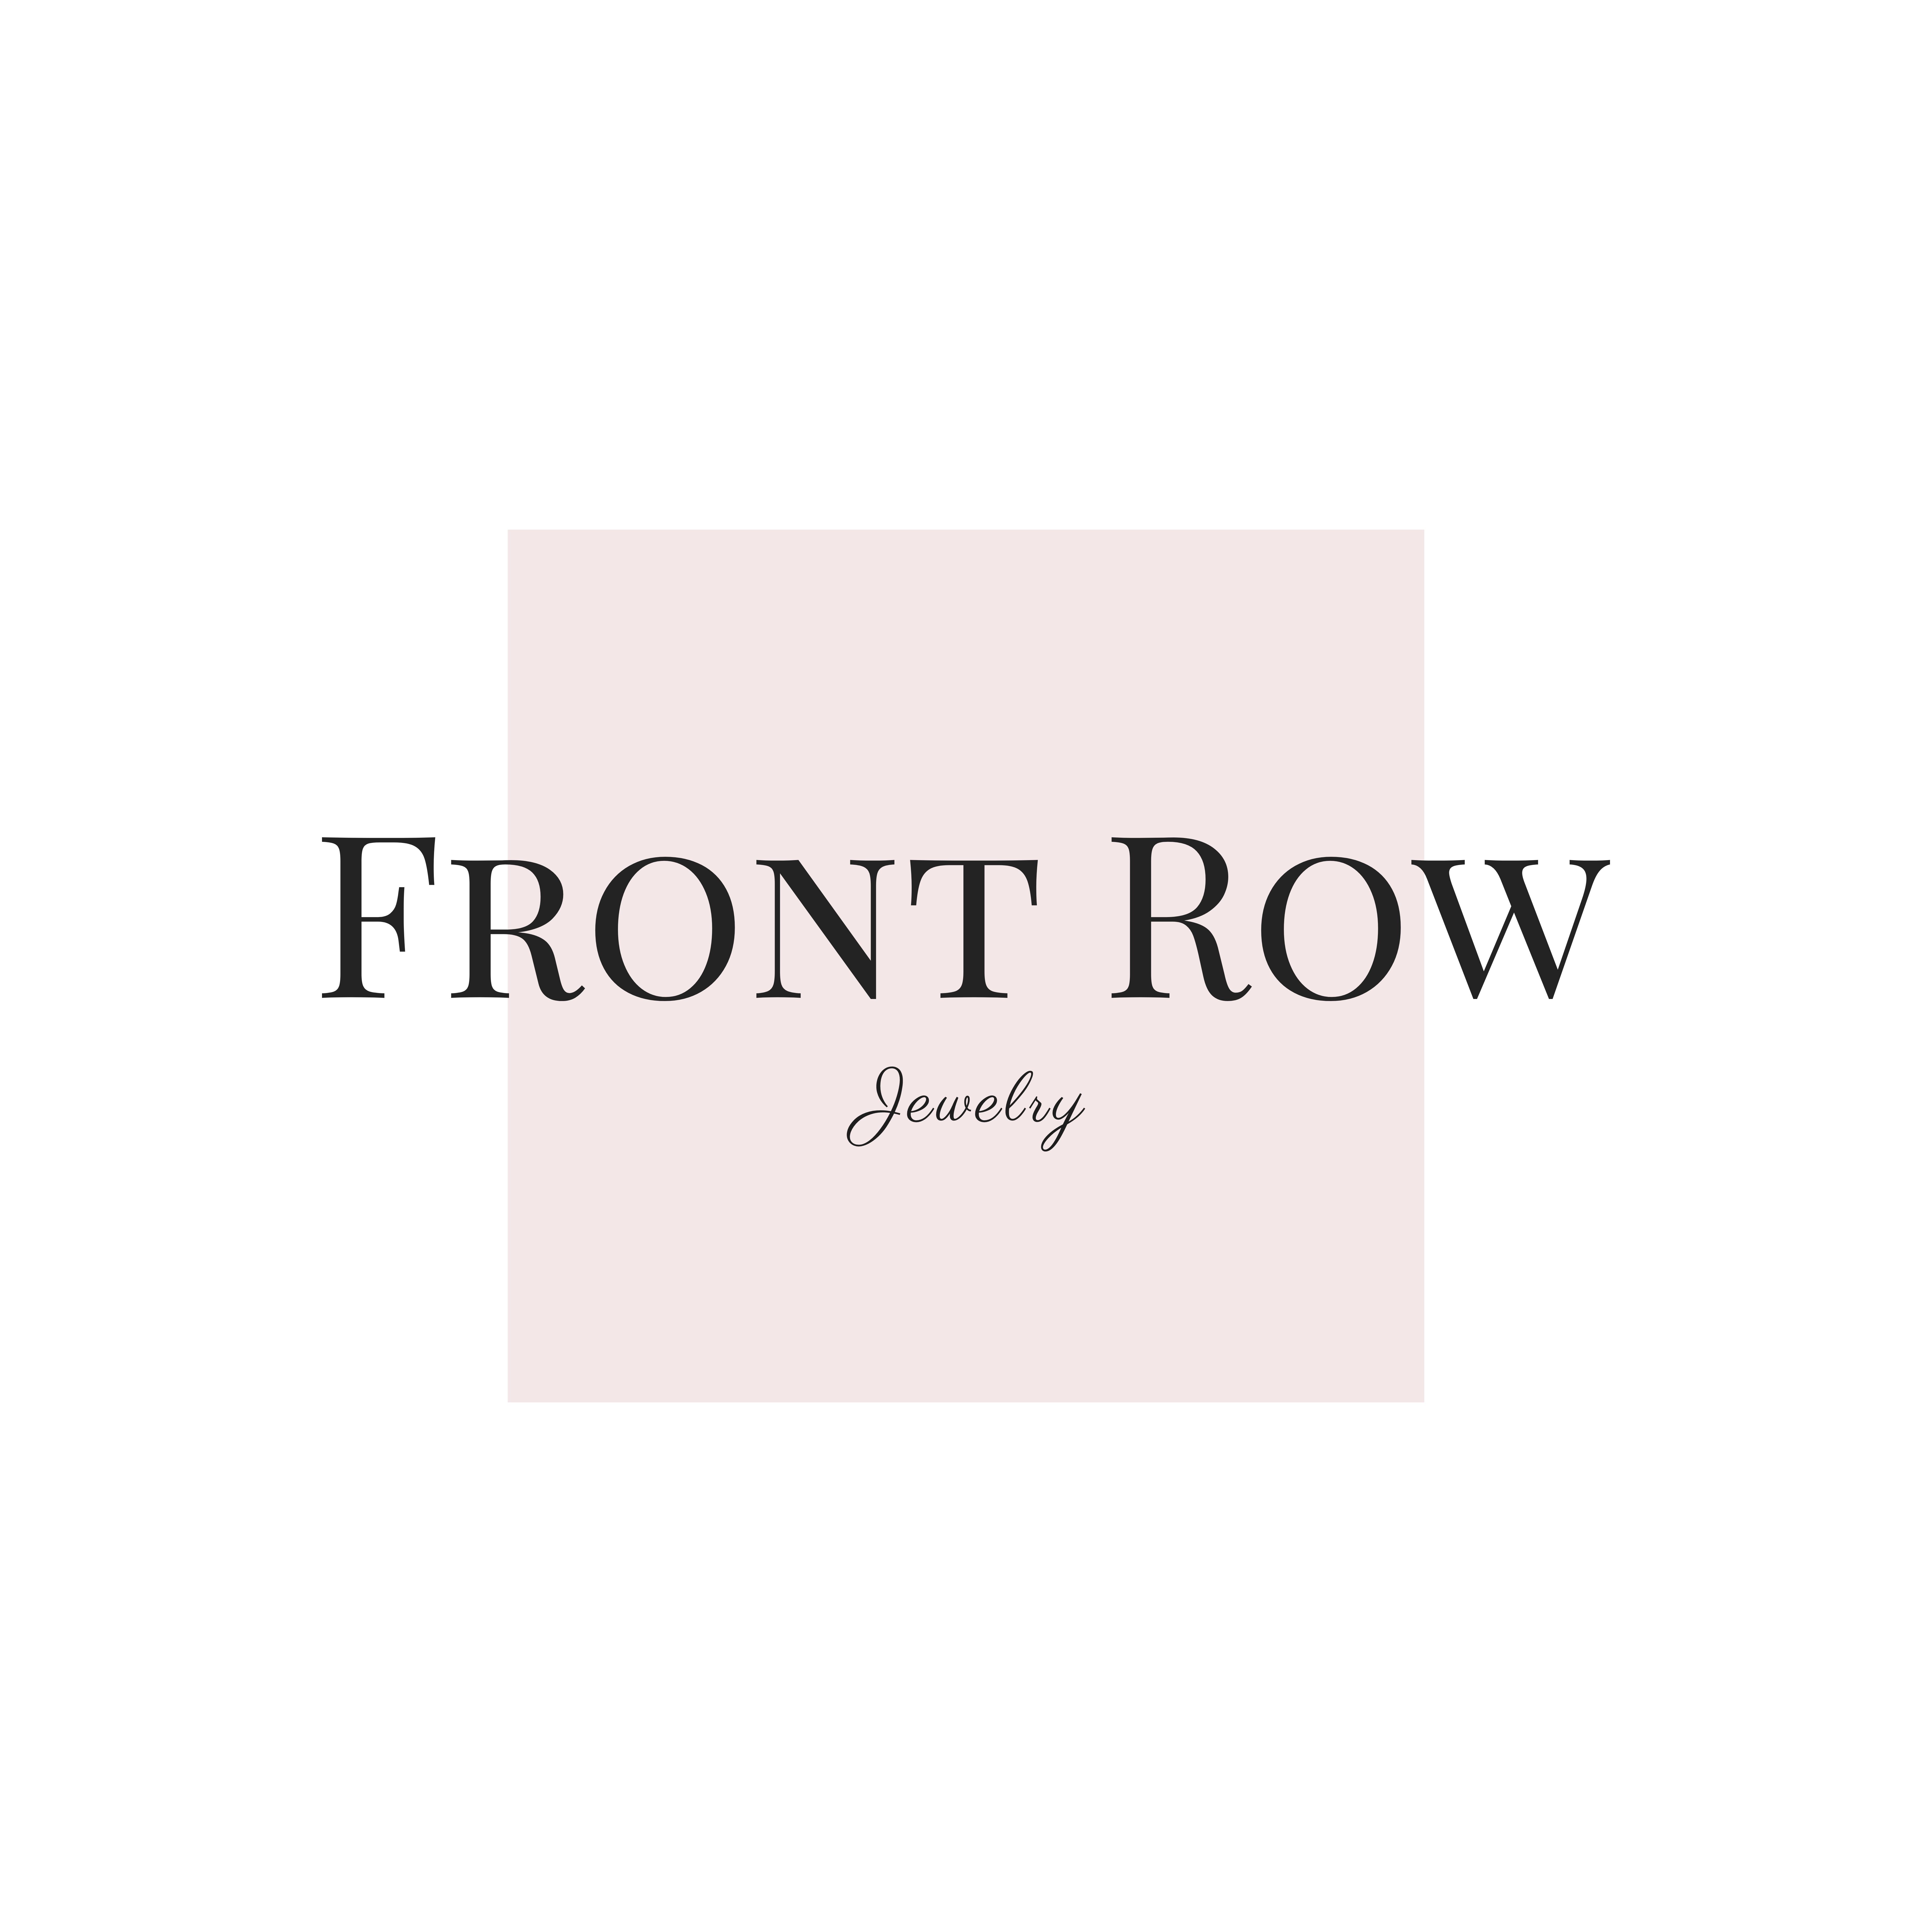 Front Row Jewelry